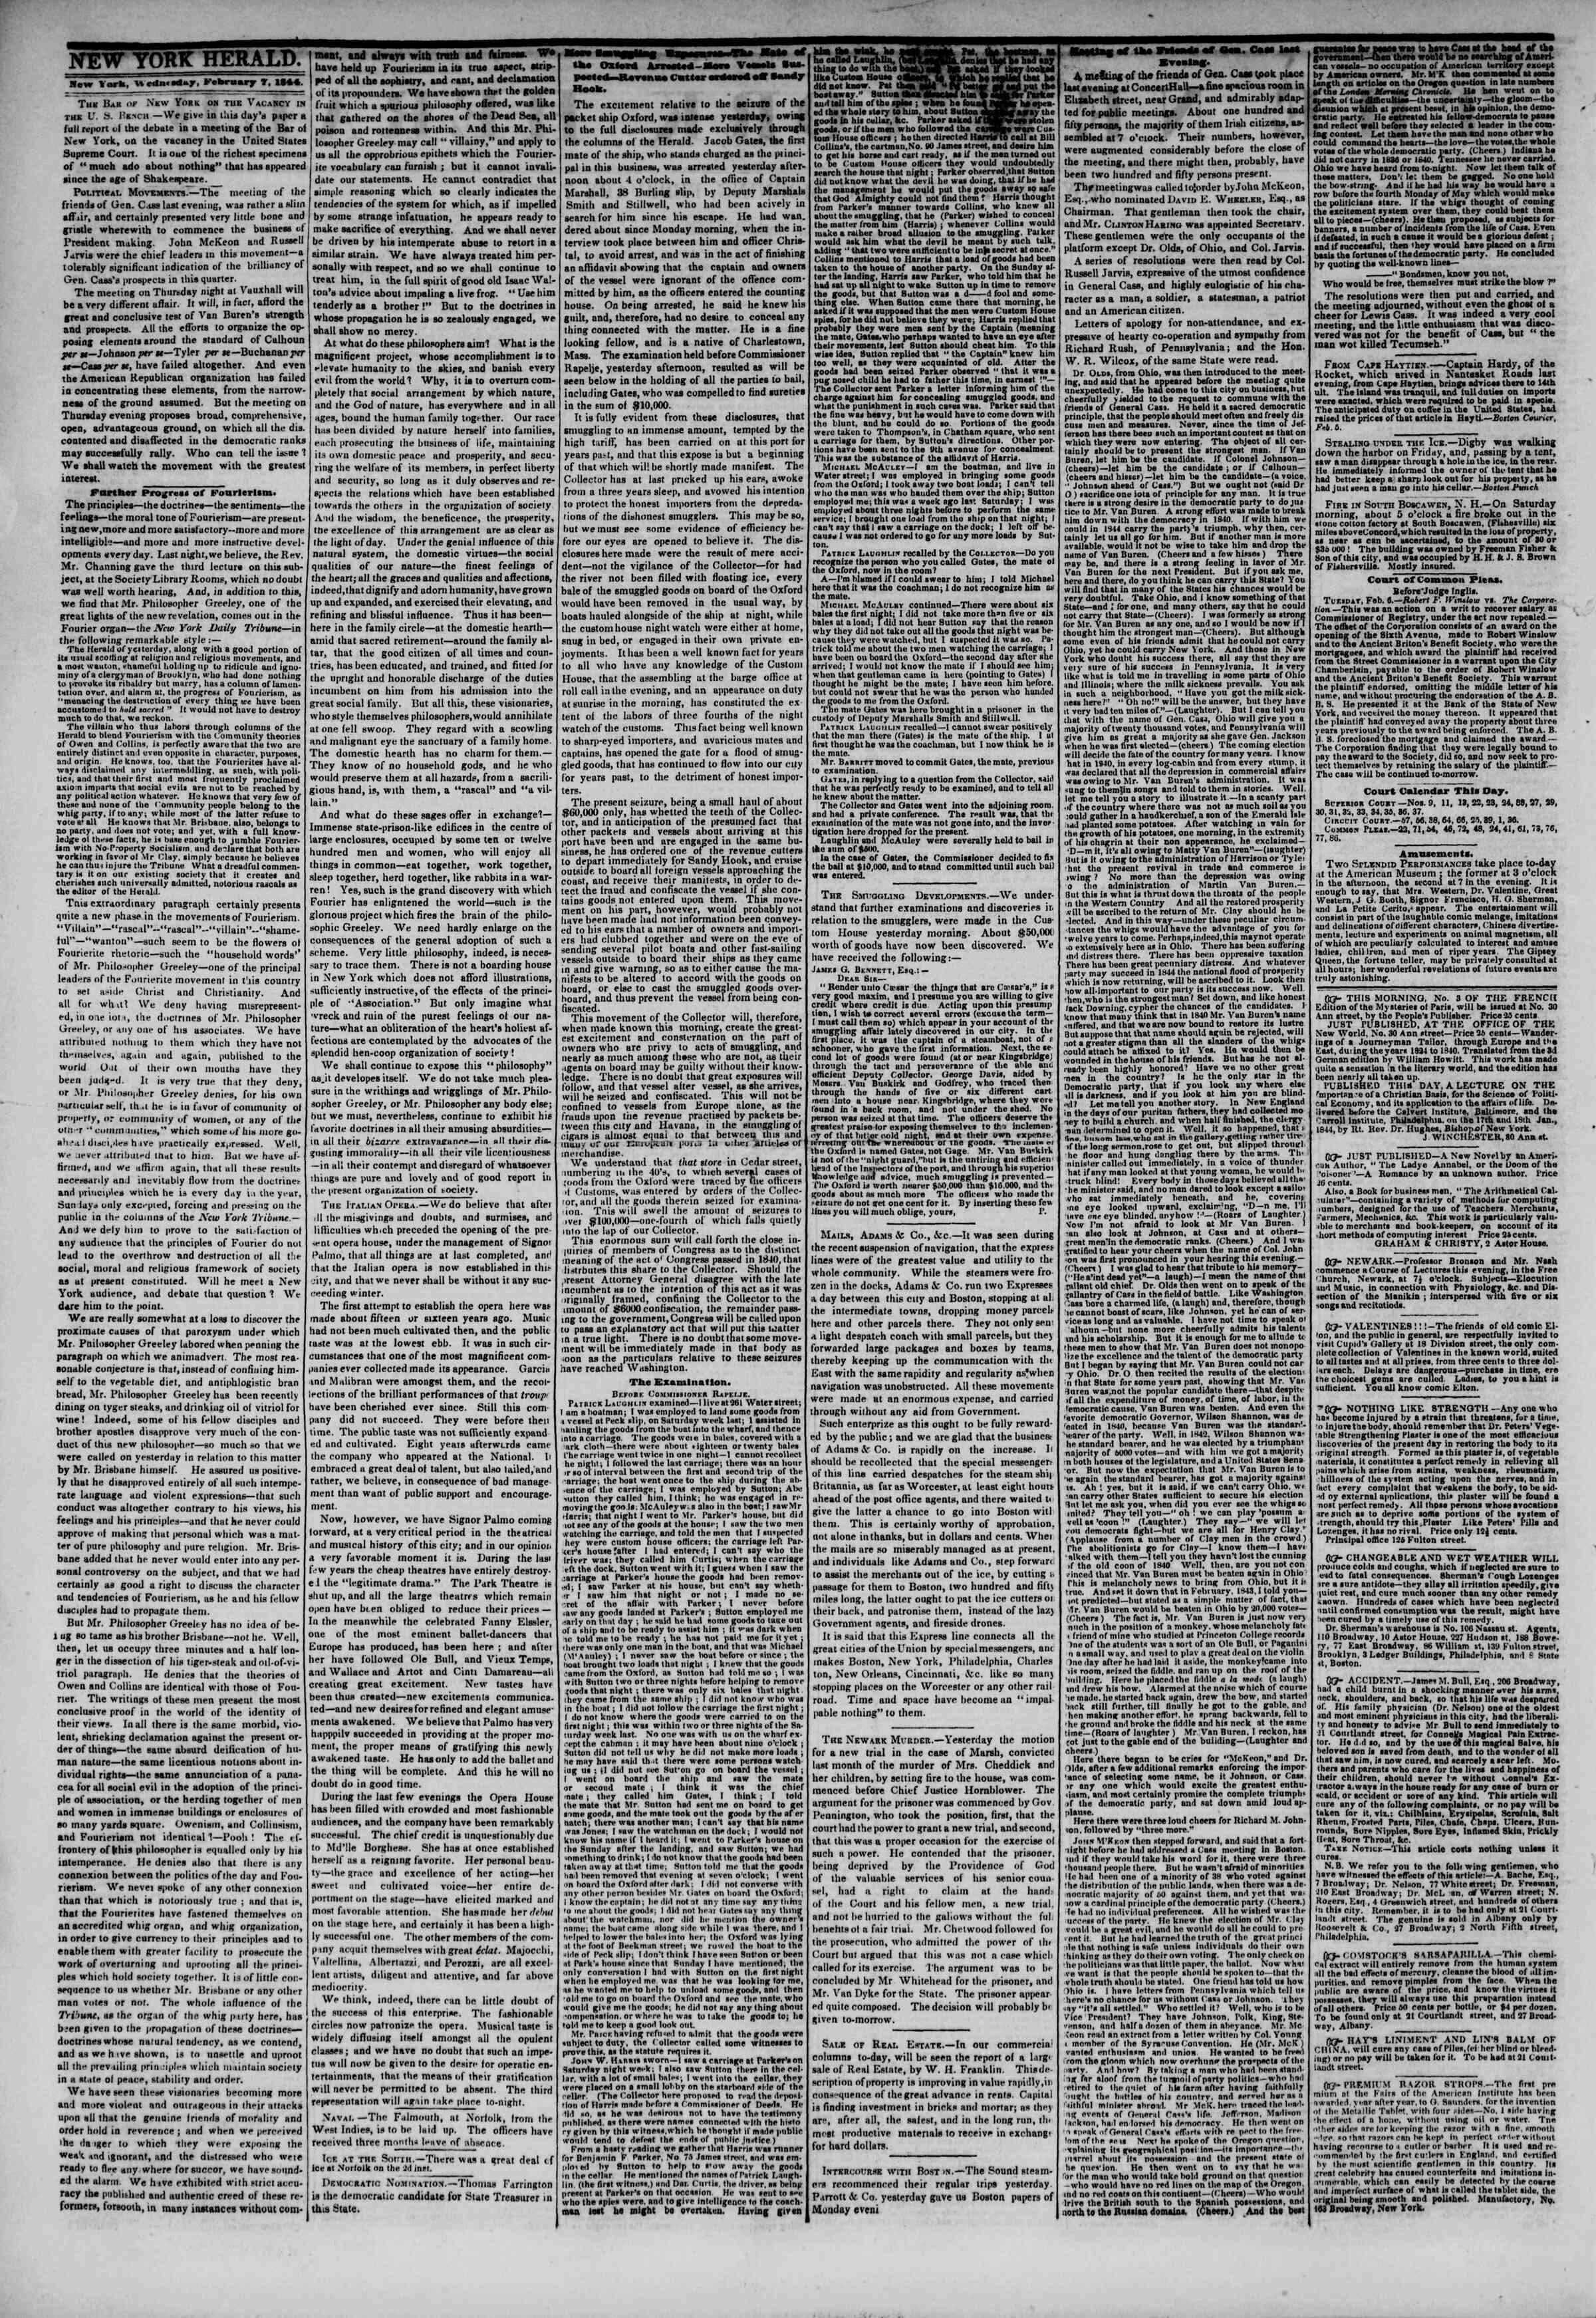 February 7, 1844 Tarihli The New York Herald Gazetesi Sayfa 2